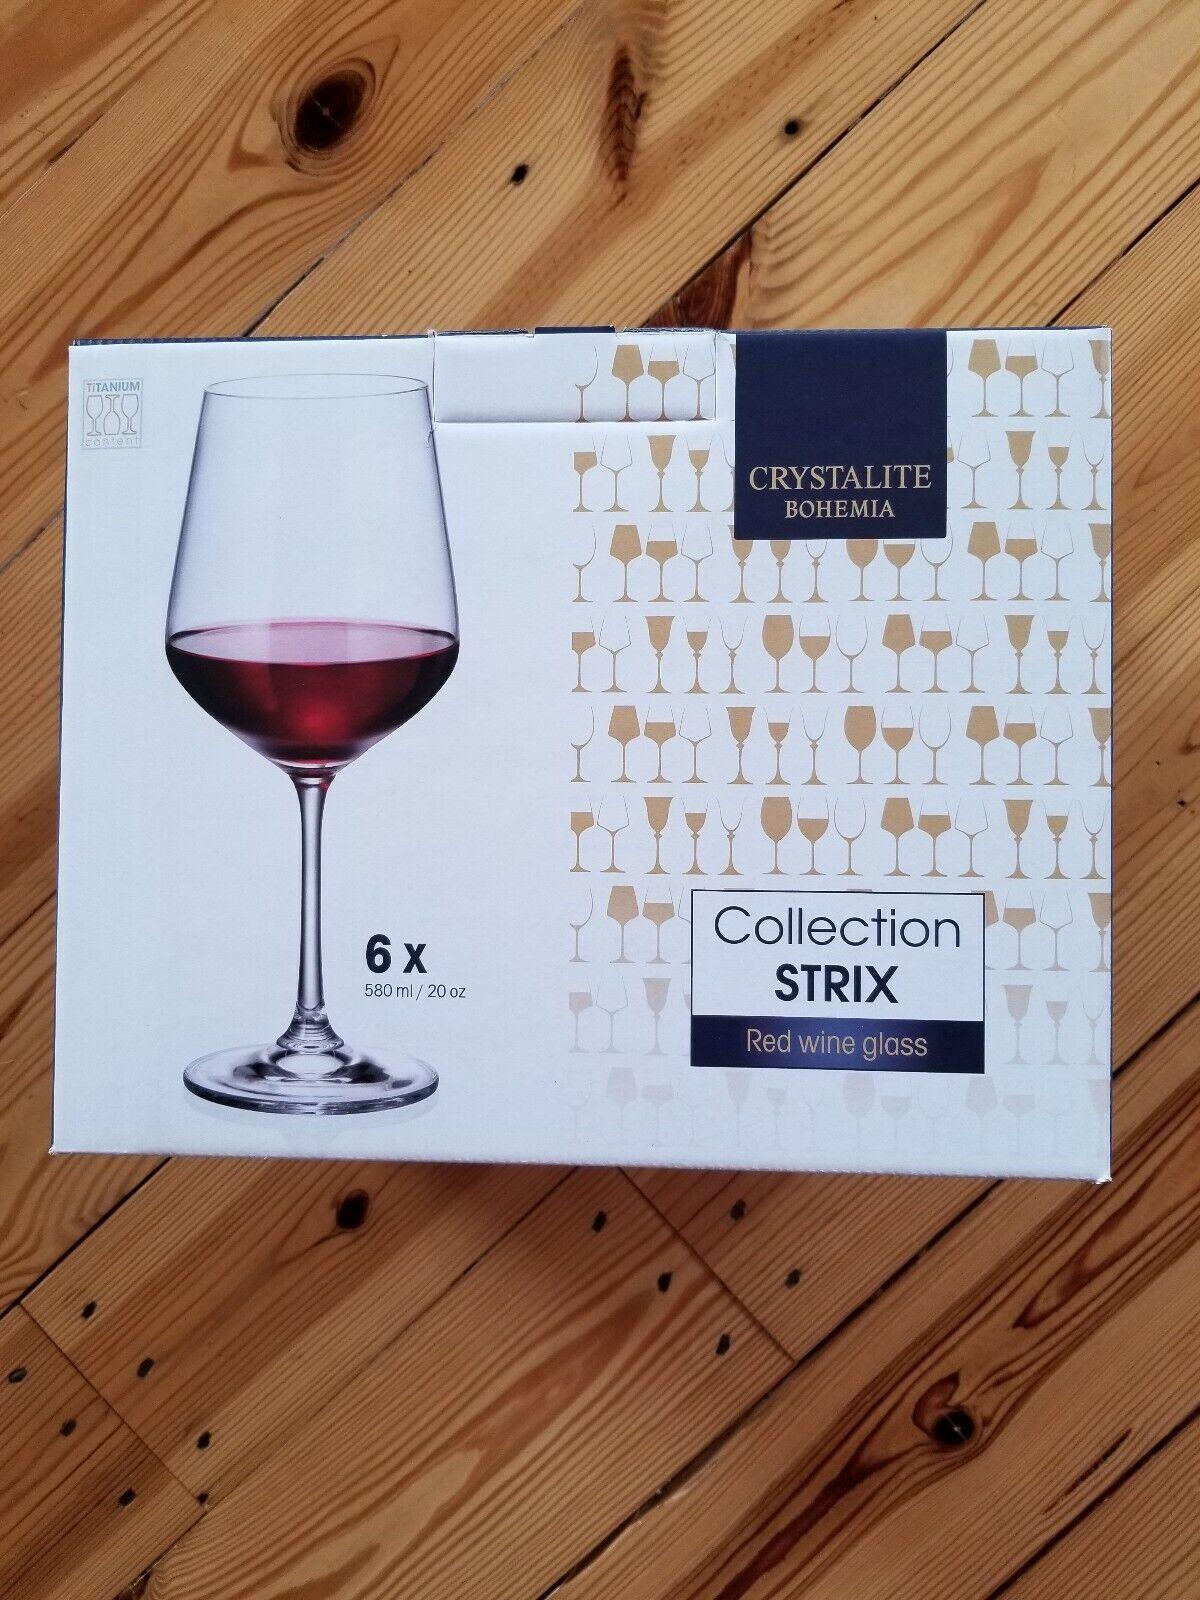 Bohemia Crystalite Strix 6 Vin Rouge Lunettes